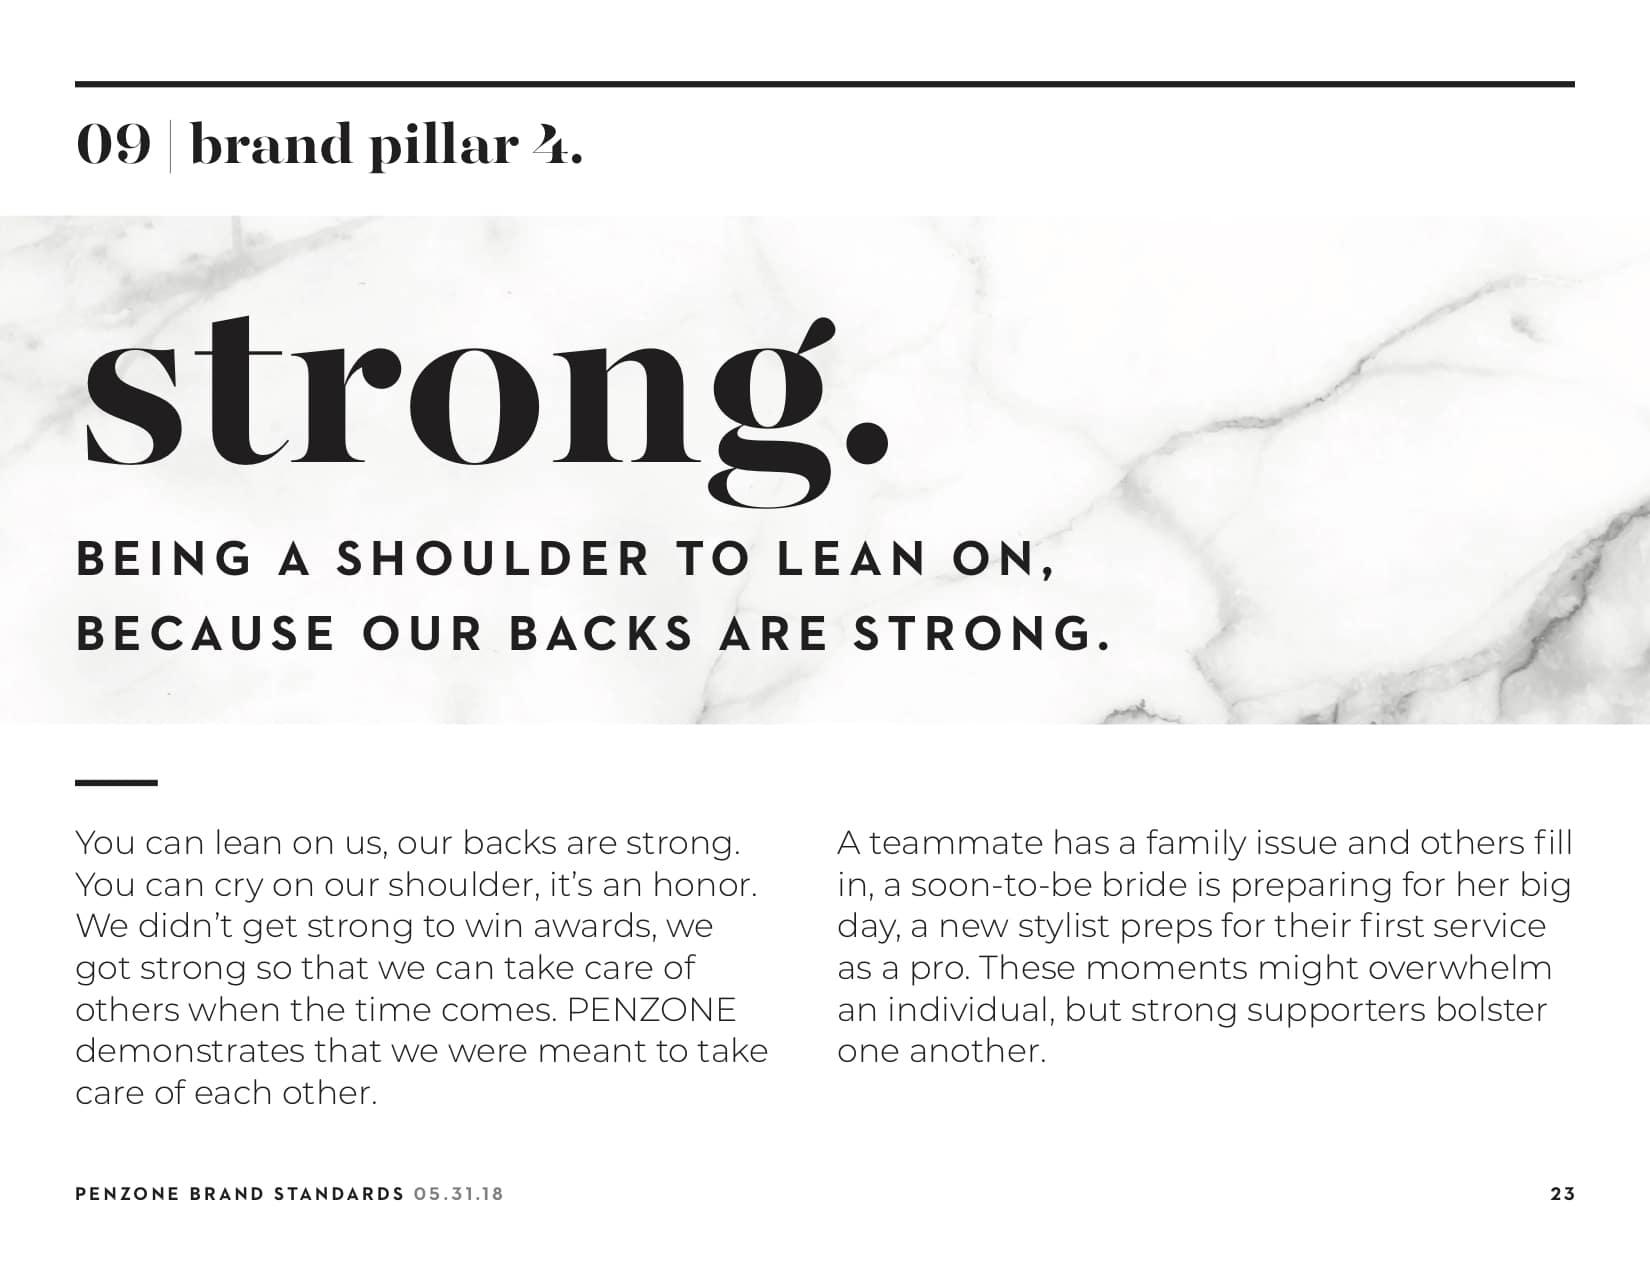 Penzone_Brand-Pillar_Strong